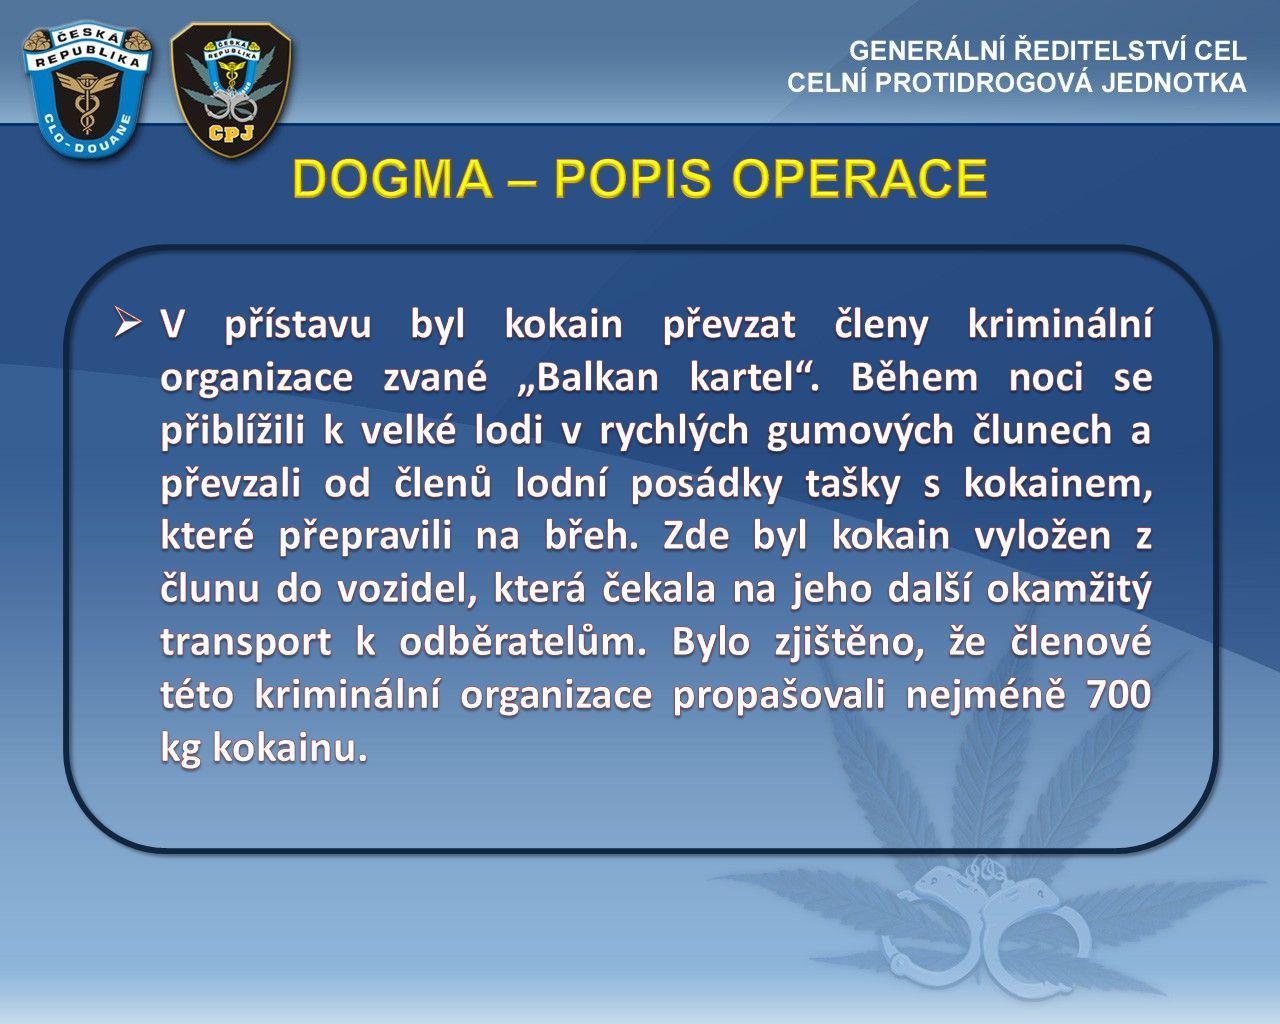 DOGMA – POPIS OPERACE